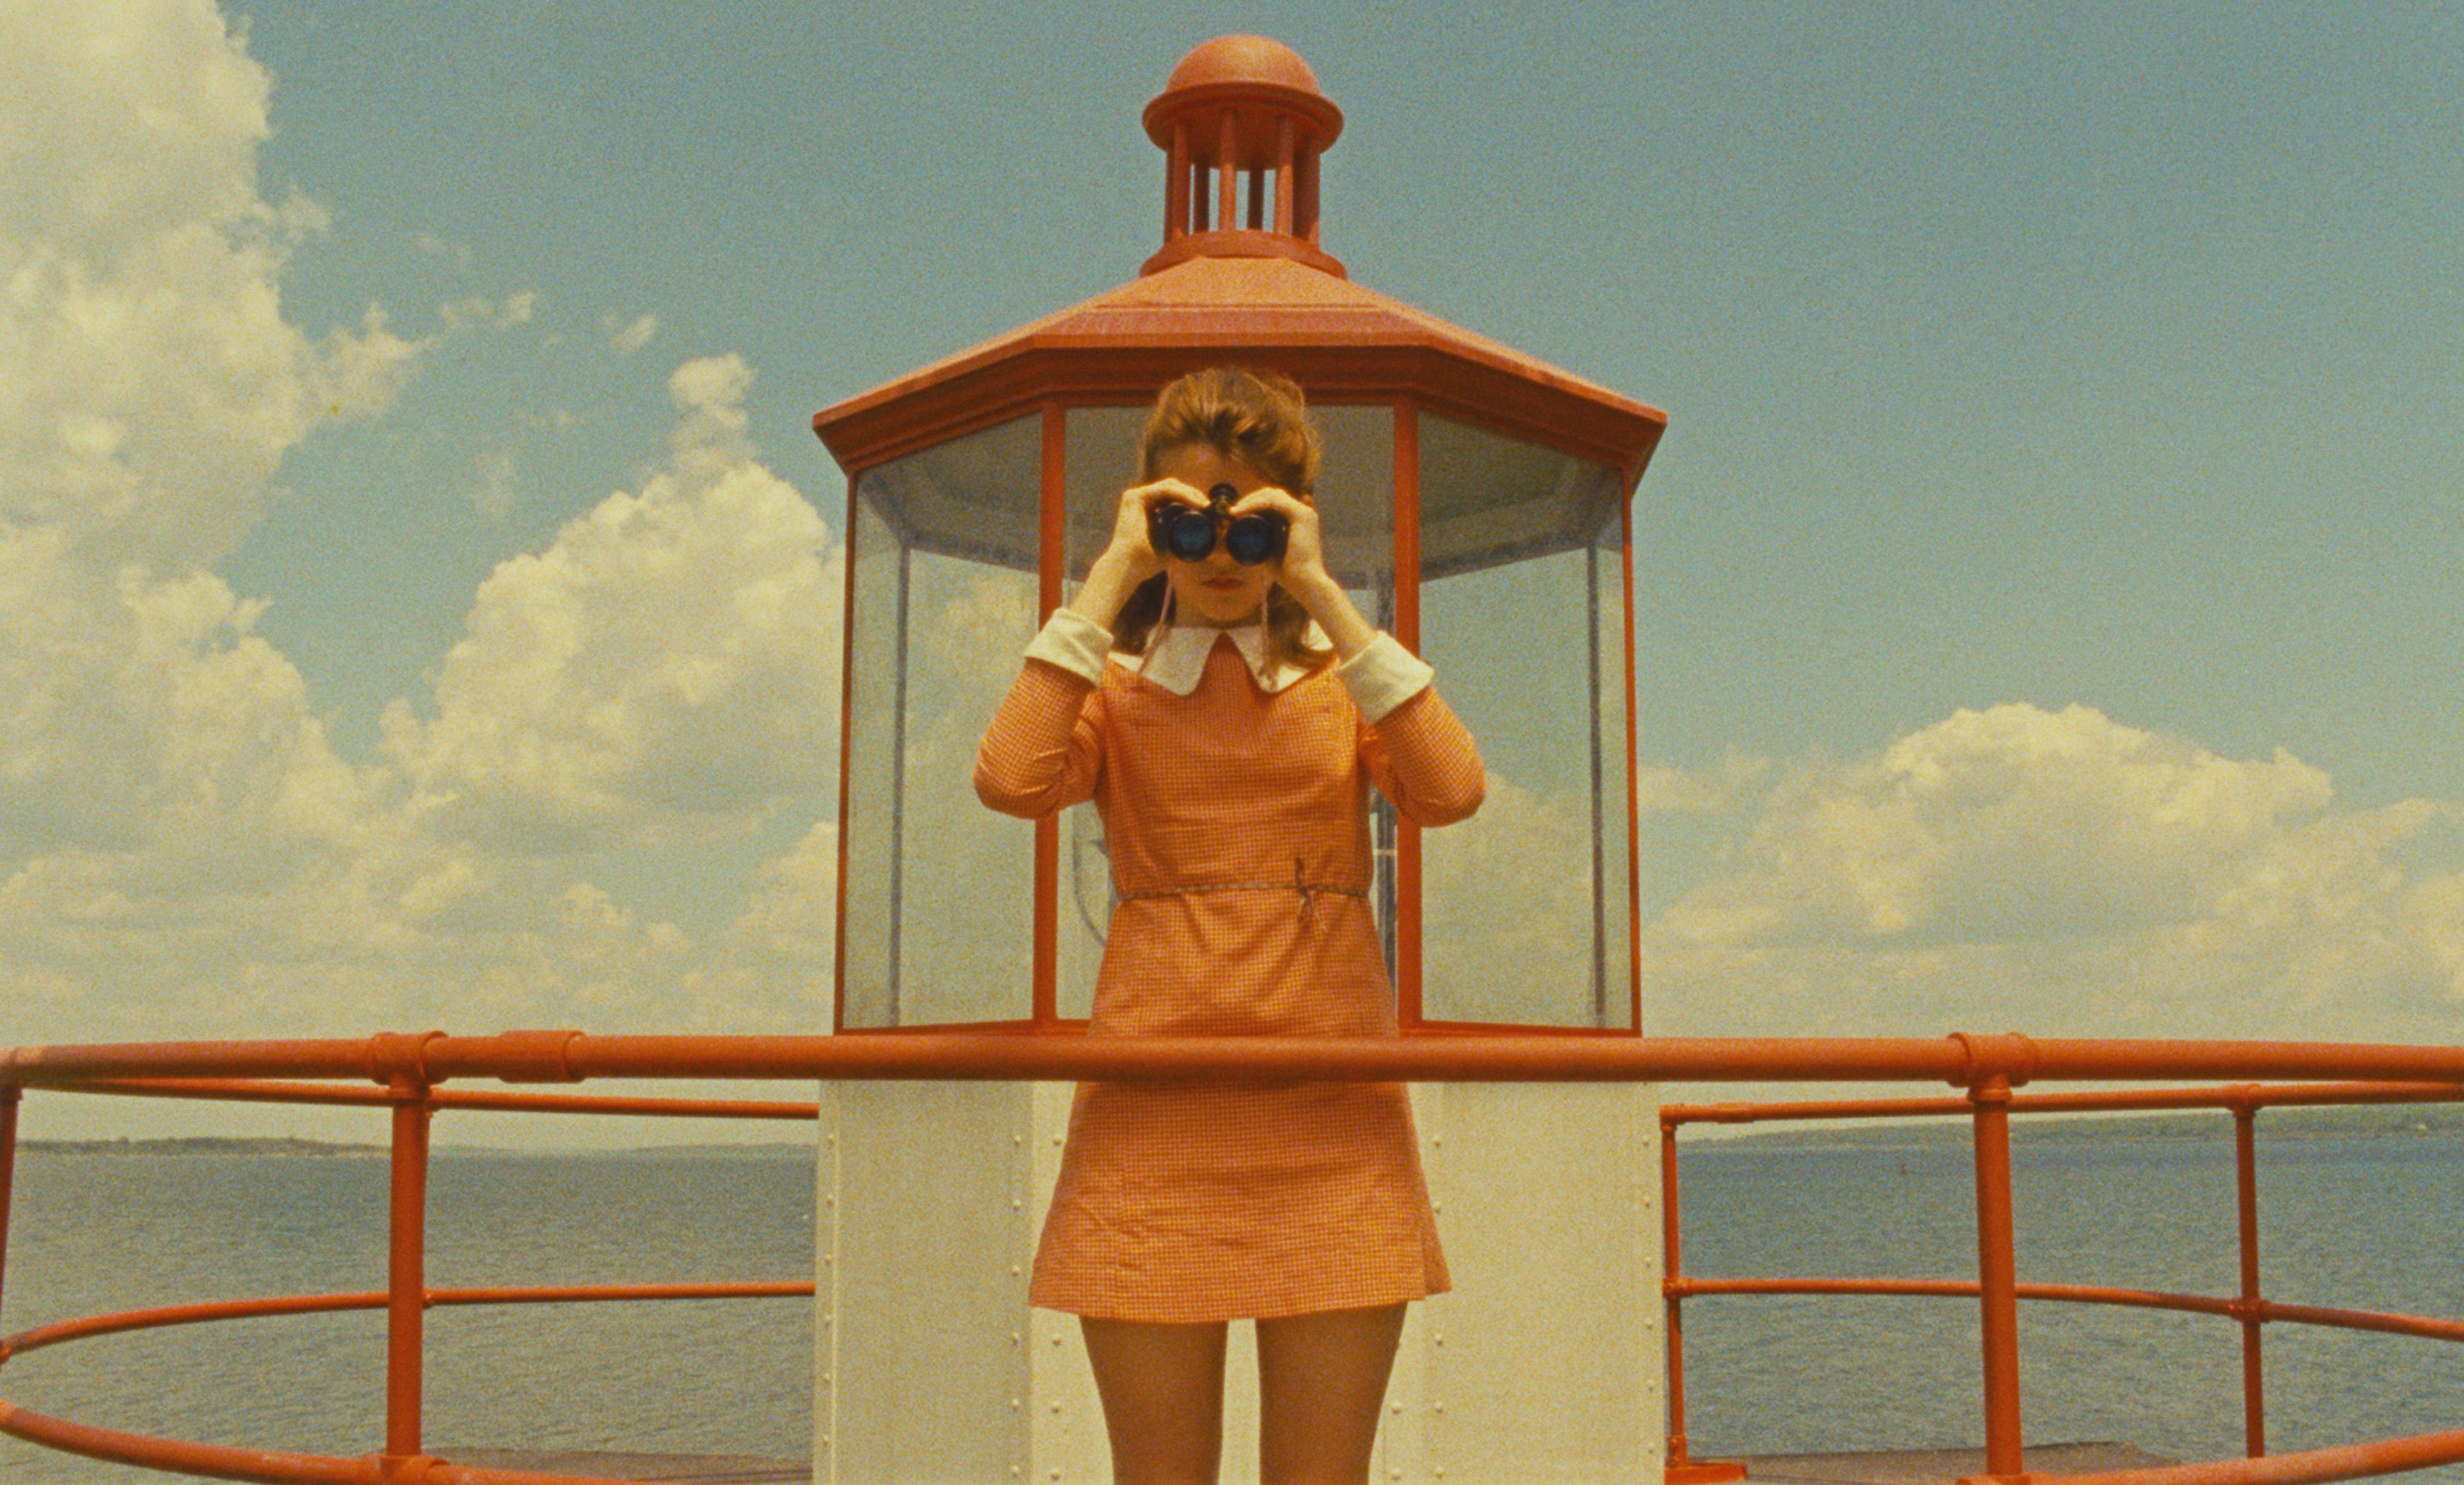 Bon Samedi 3-films-voir-temps-brumeux-L-IM_XgG